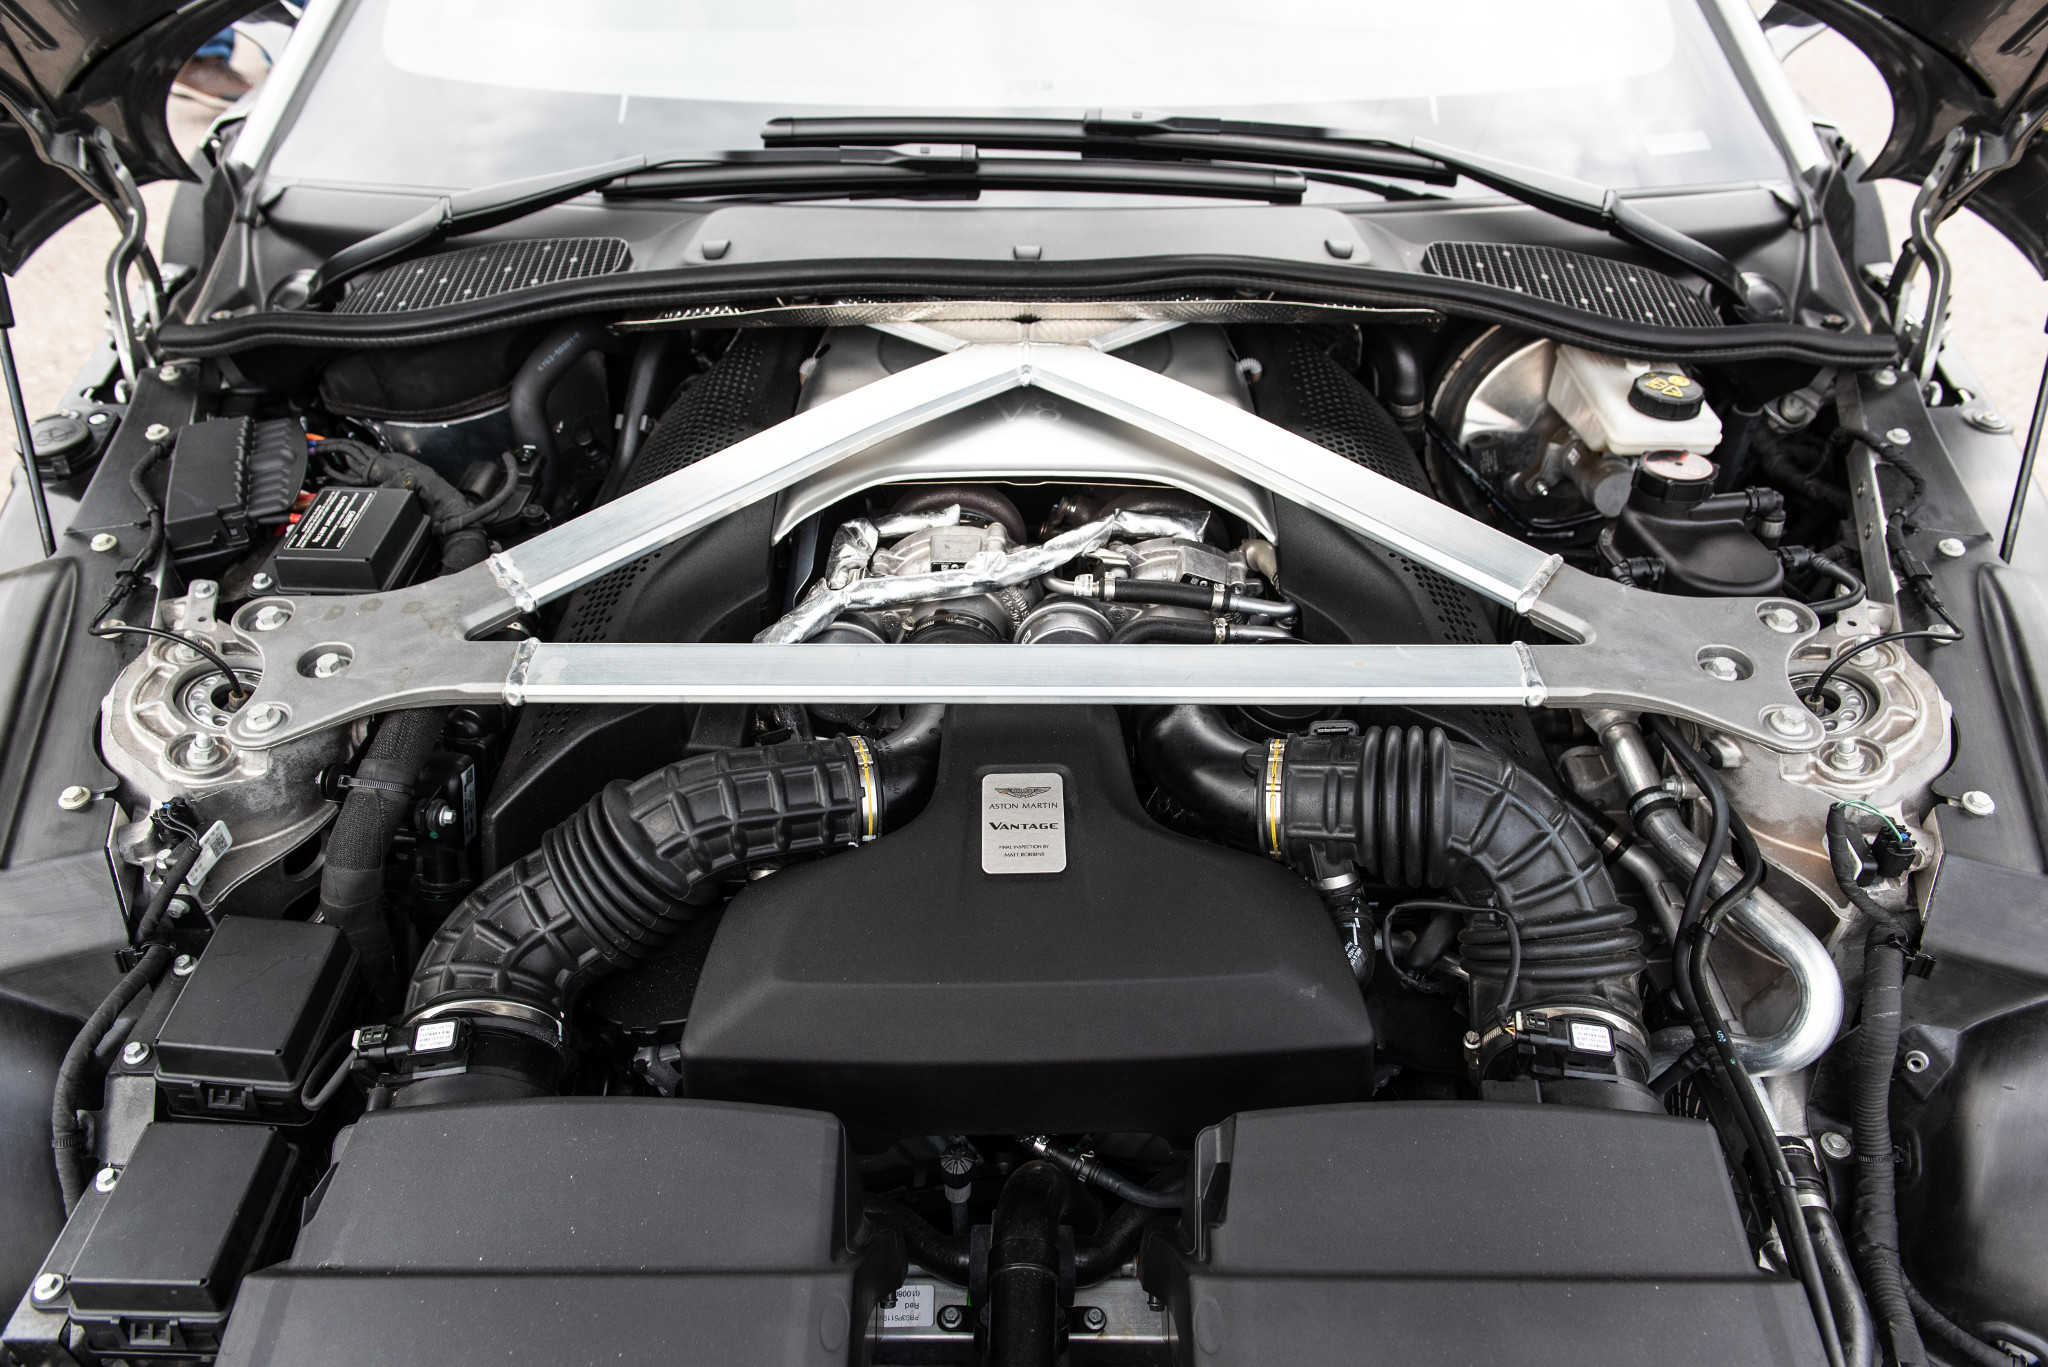 17-aston-martin-vantage-2018-engine--exterior--silver.jpg